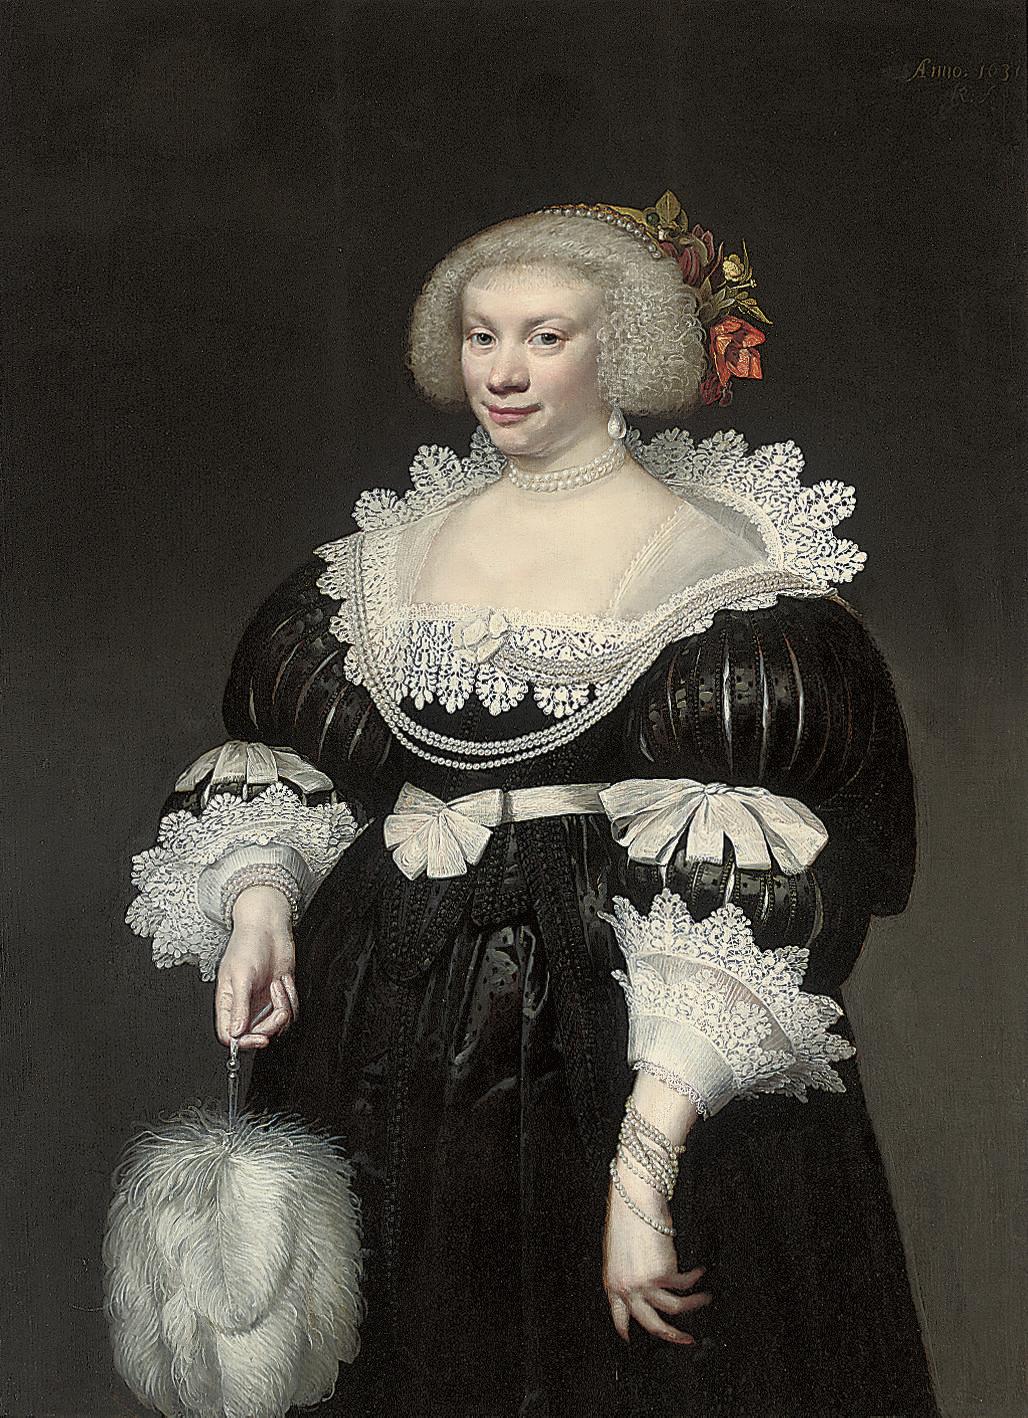 Jan Anthonisz. van Ravesteyn (